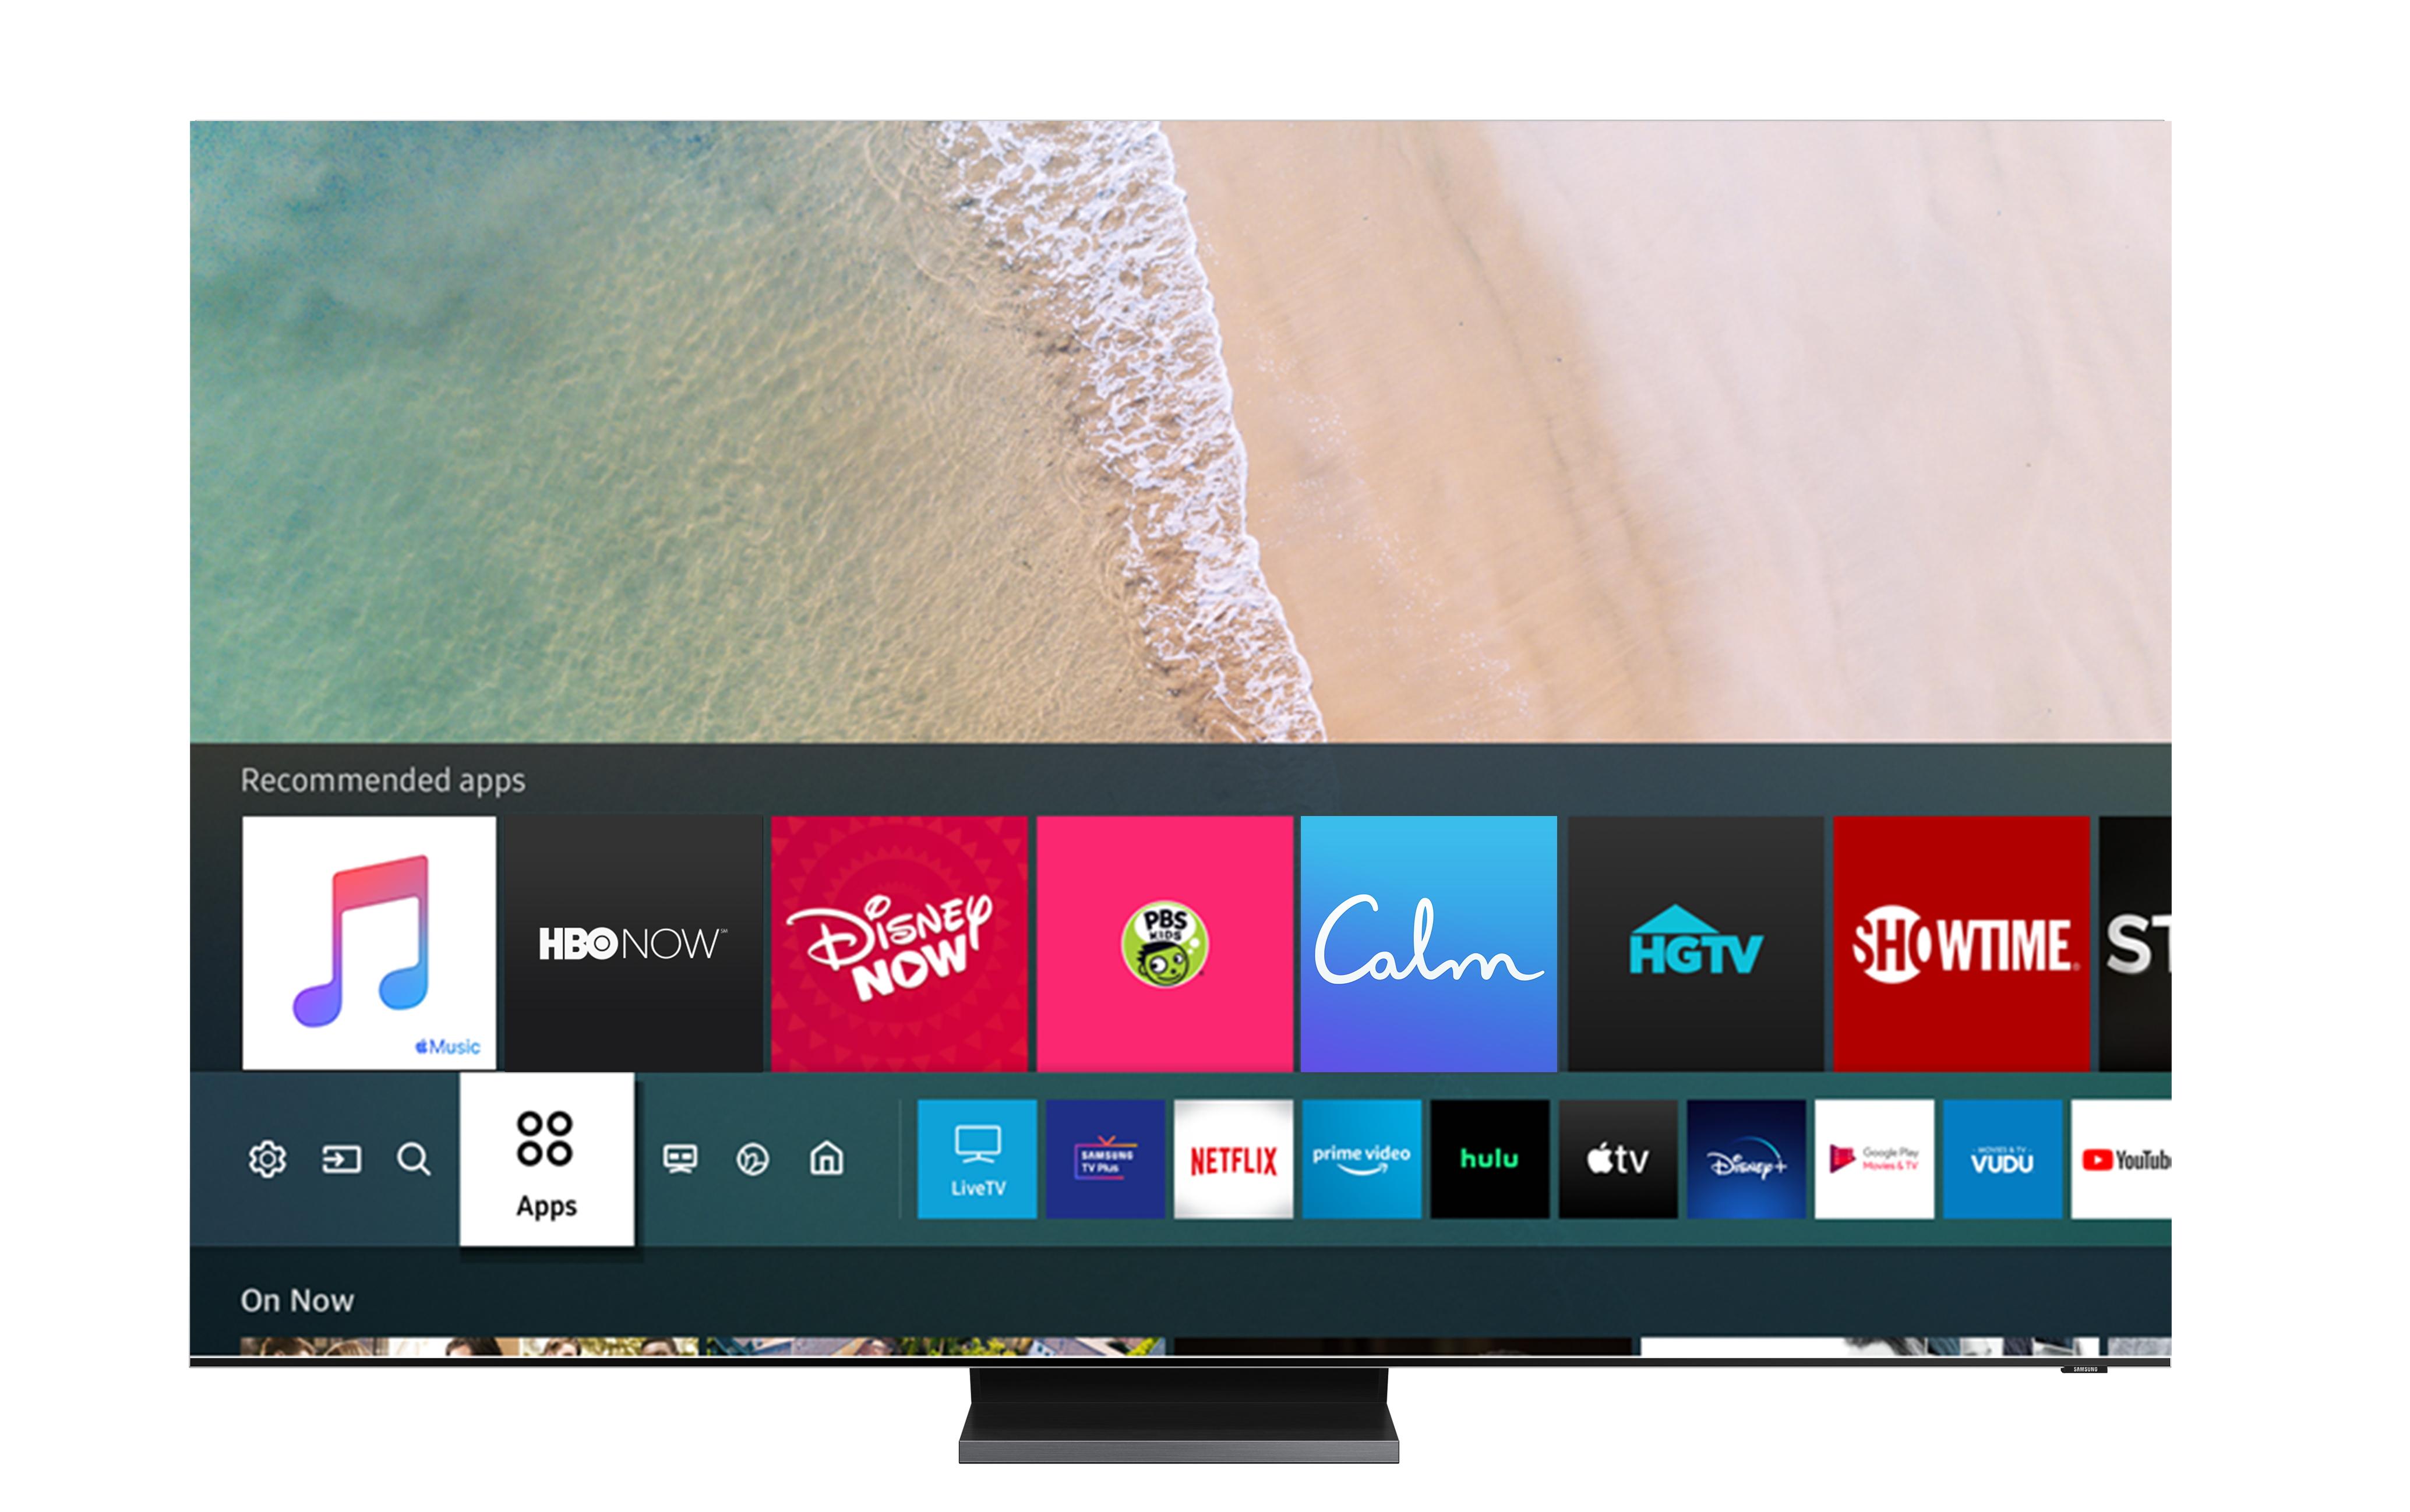 Samsung-Smart-TV-and-Apple-Music_02.jpg (4137×2596)